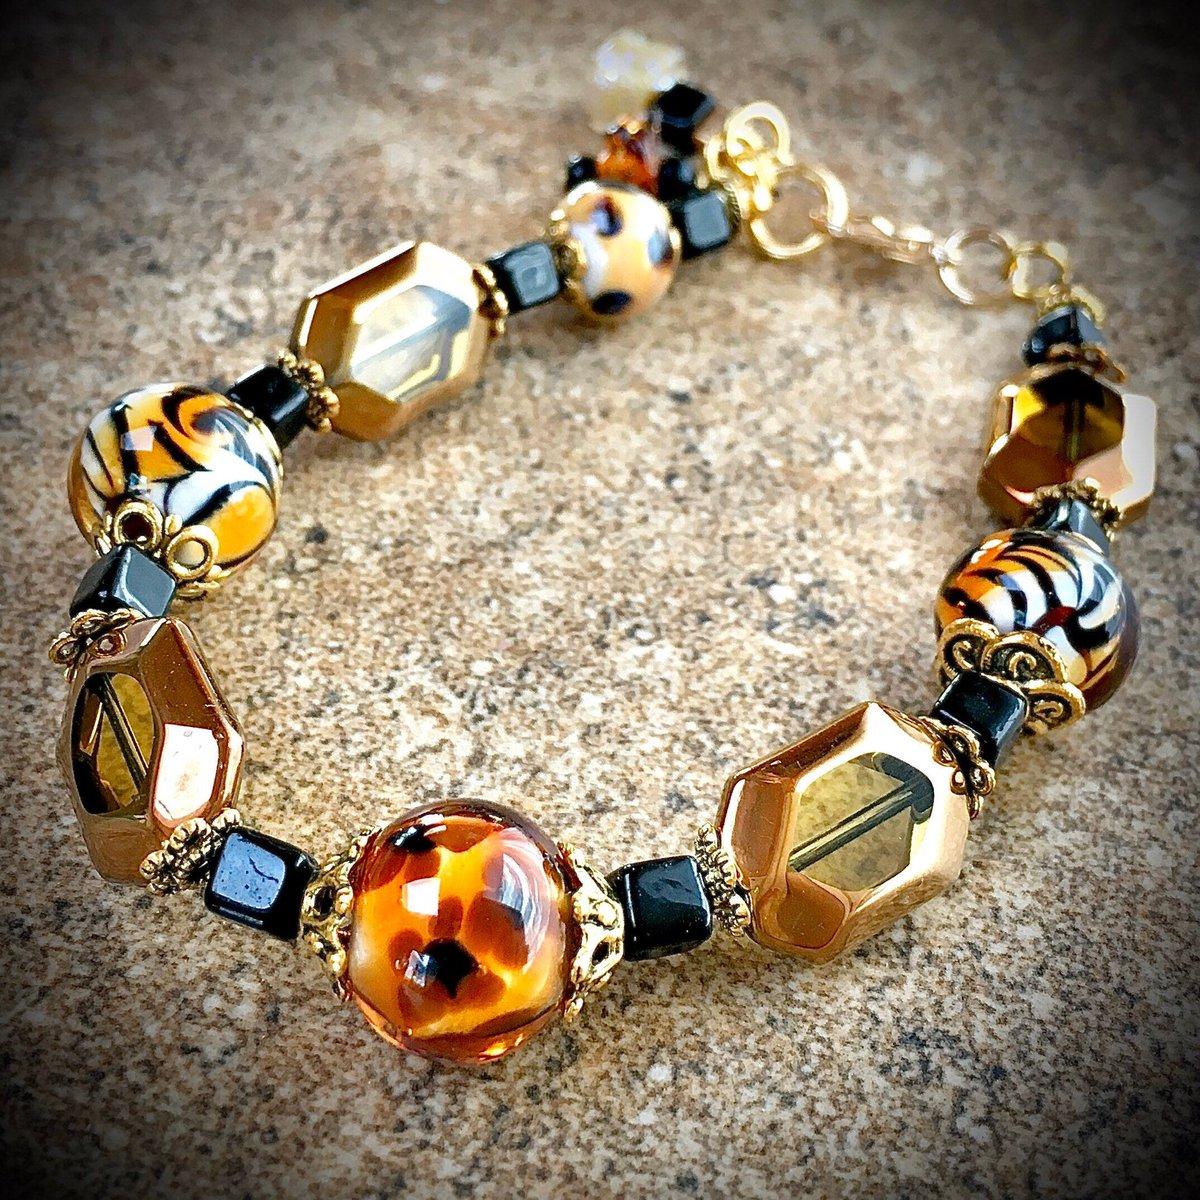 Look what I made! Animal Print Lampwork Bracelet #jewelry #bracelet #lampwork #handmade #lampworkbead #animalprint